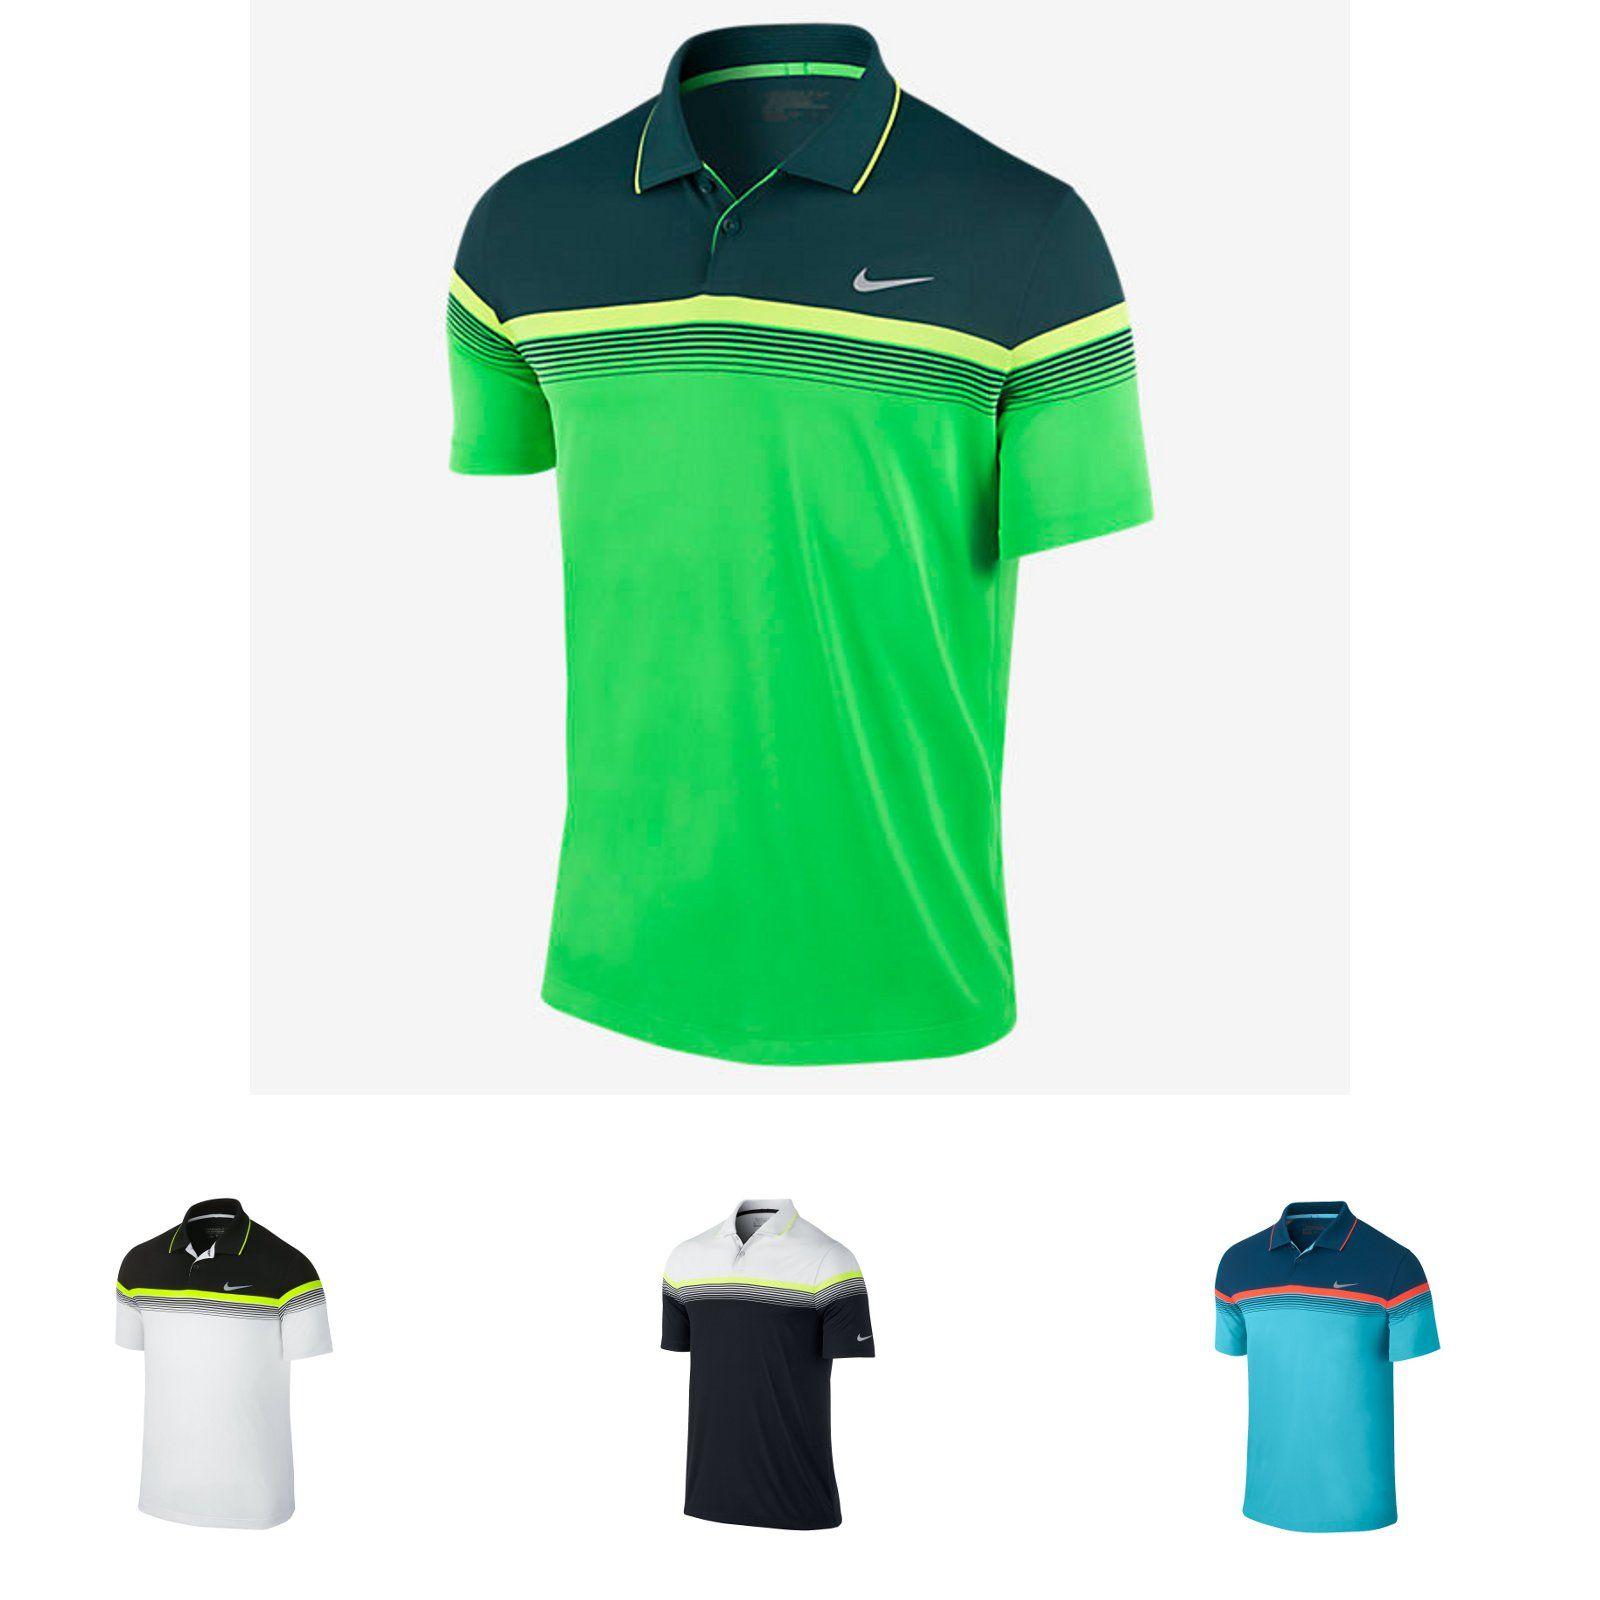 Más allá Odia tienda  Nike Modern Major Moment Golf Polo Shirt - | Golf polo shirts, Golf polo,  Polo